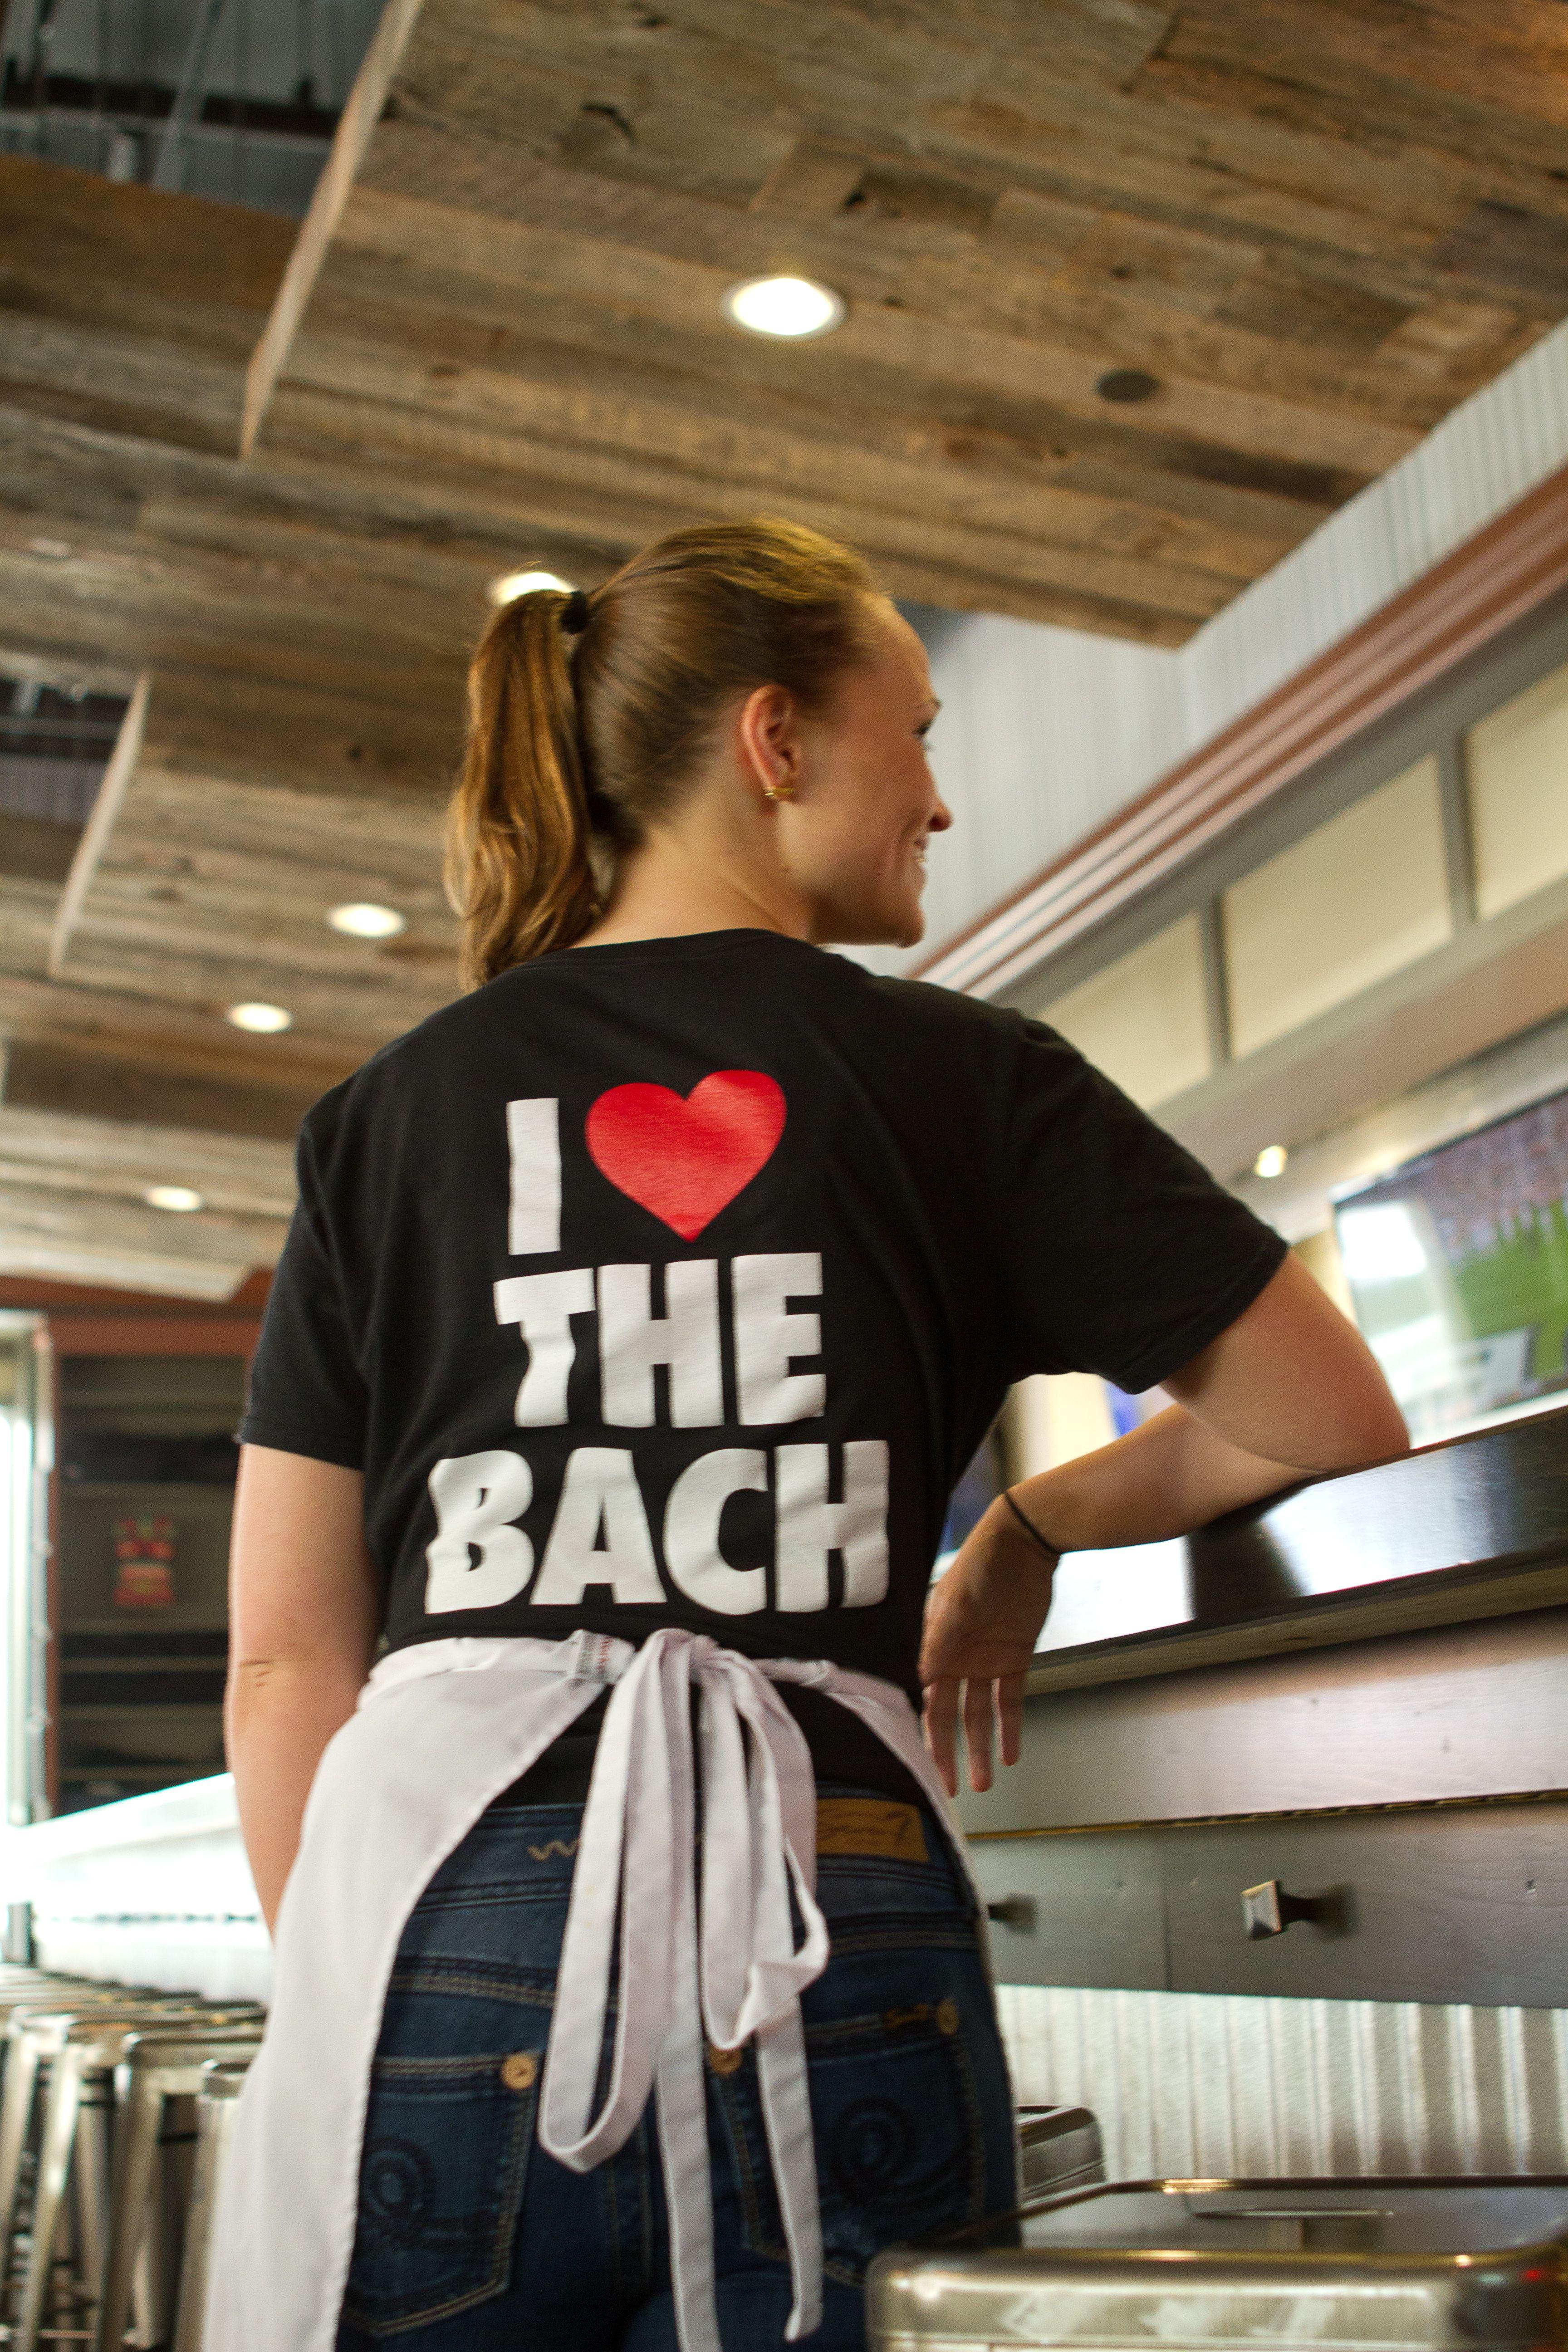 Burger Bach t-shirts: I LOVE THE BACH #burgerbach